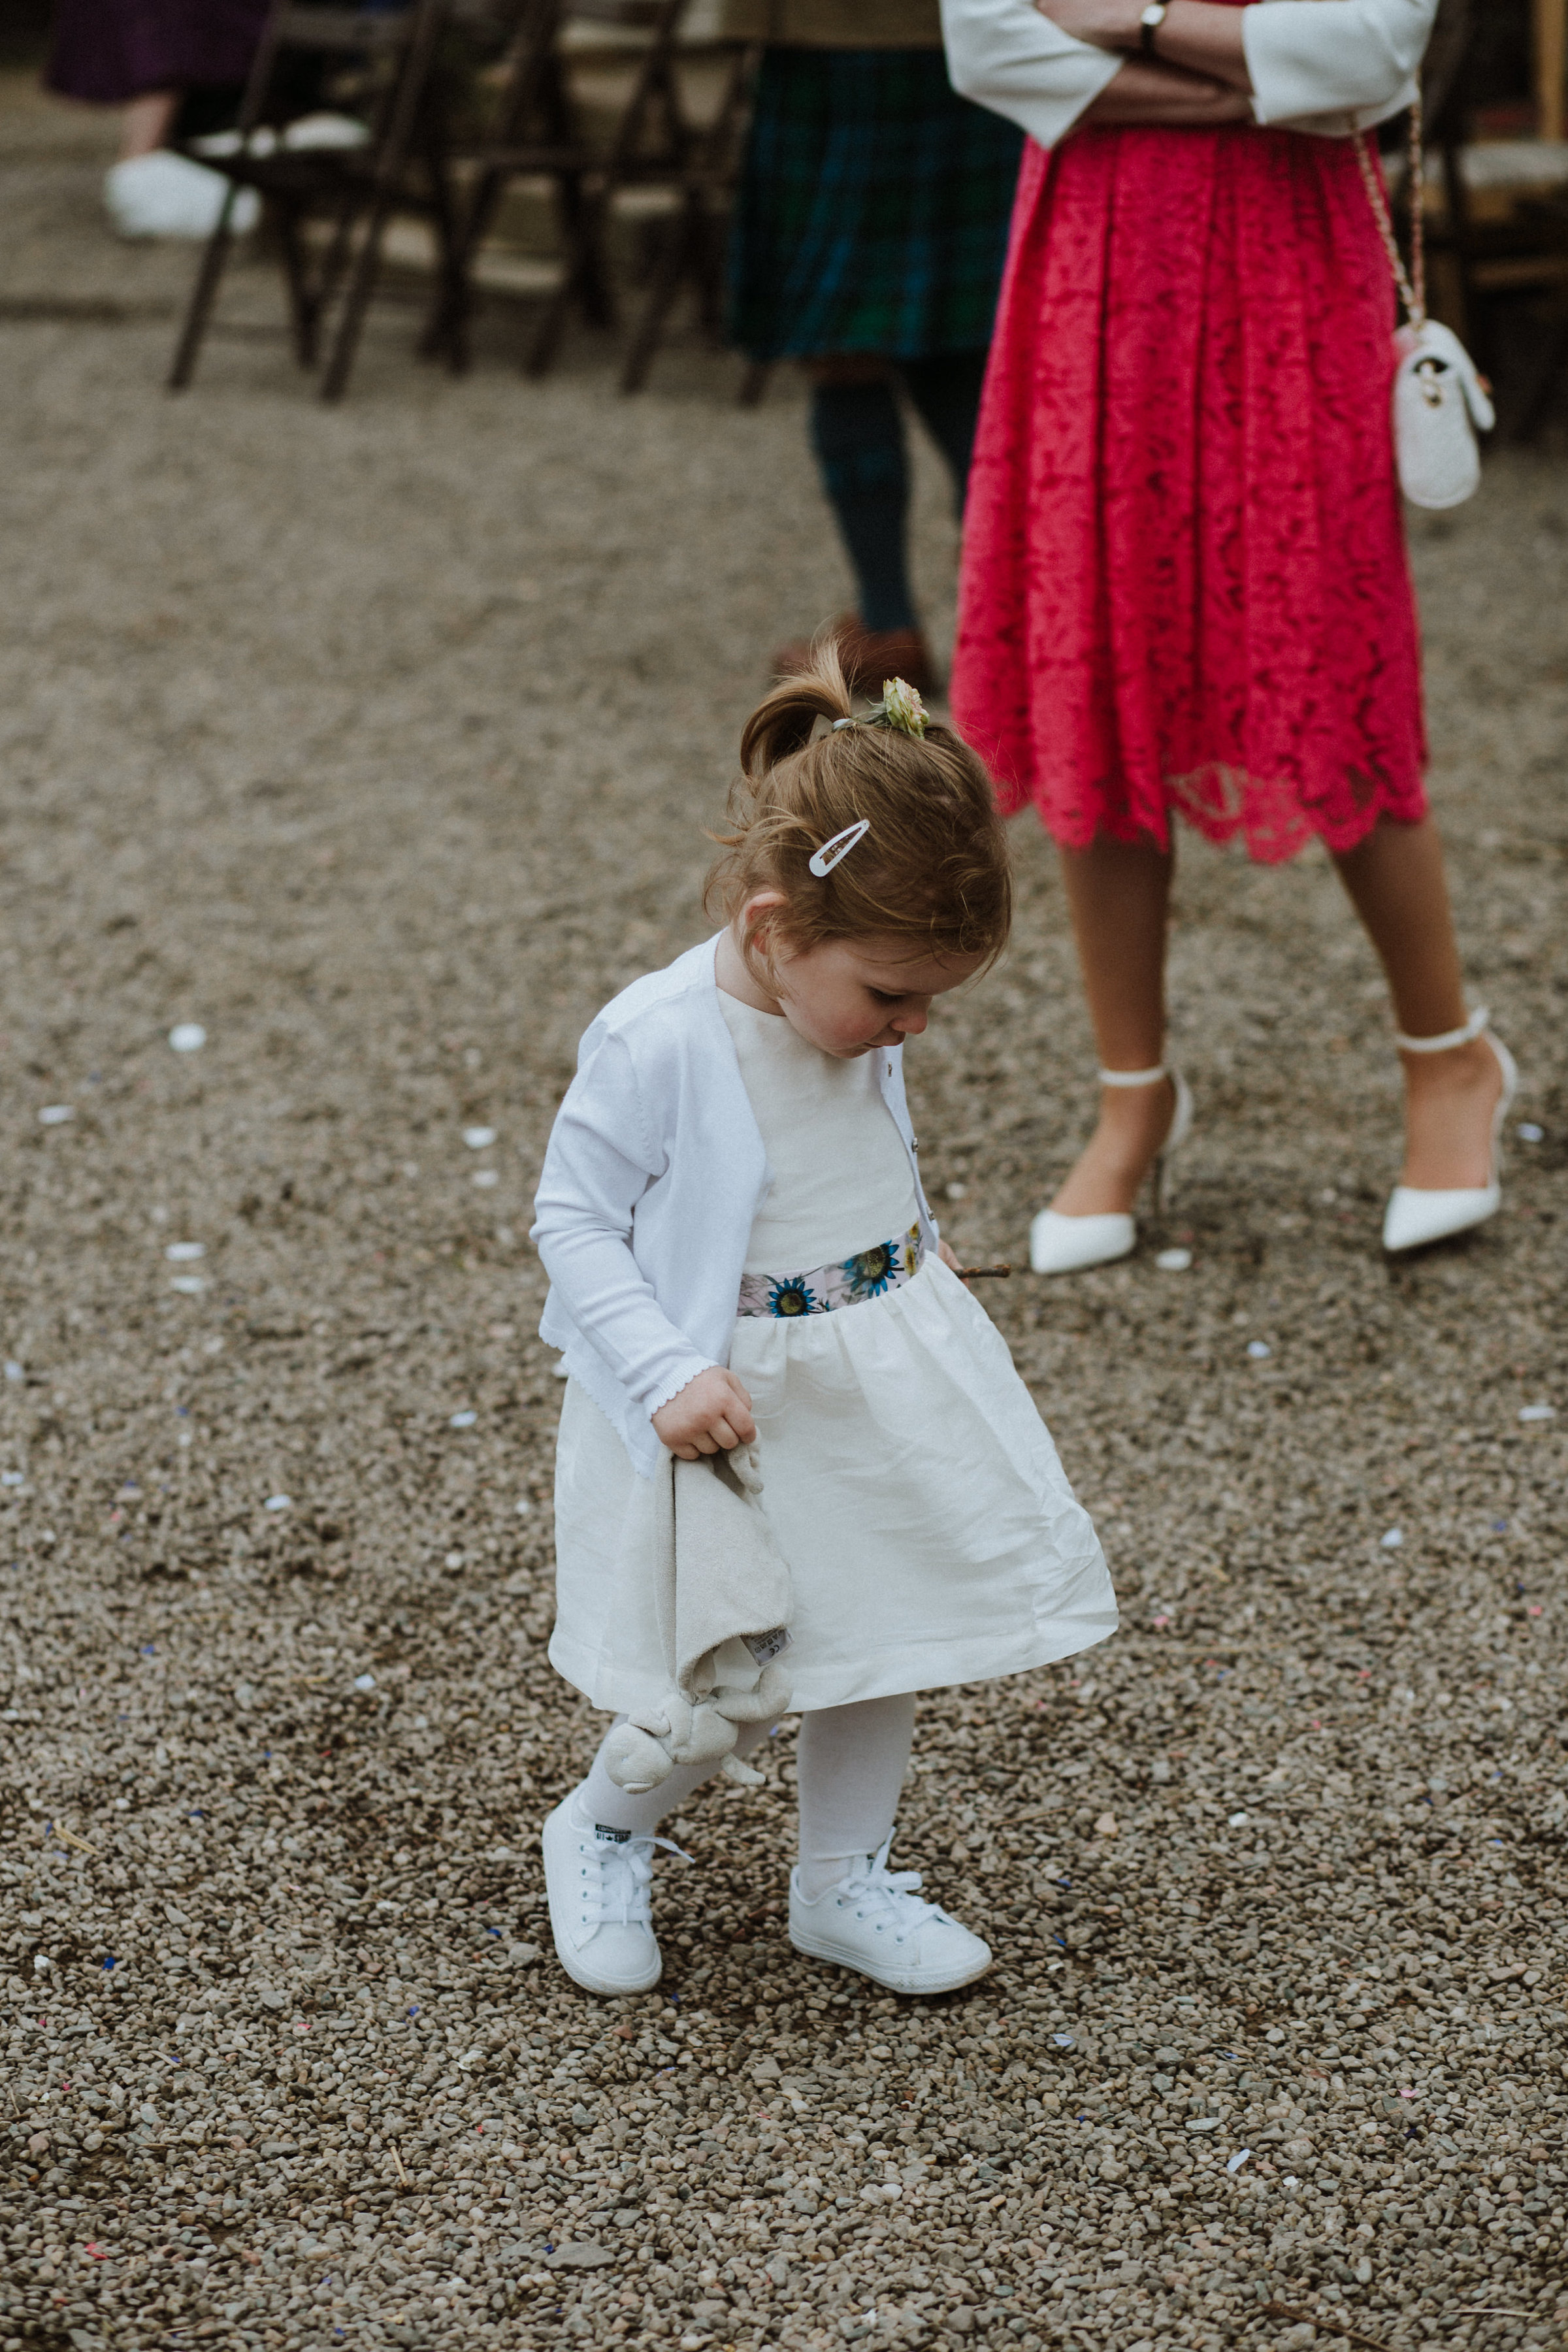 Katt-Scotland-Comrie-Crieff-Bias-Crepe-Wedding-Gown-Lace-Bridal-Biker-Jacket-Bespoke-Susanna-Greening-Derbyshire-16